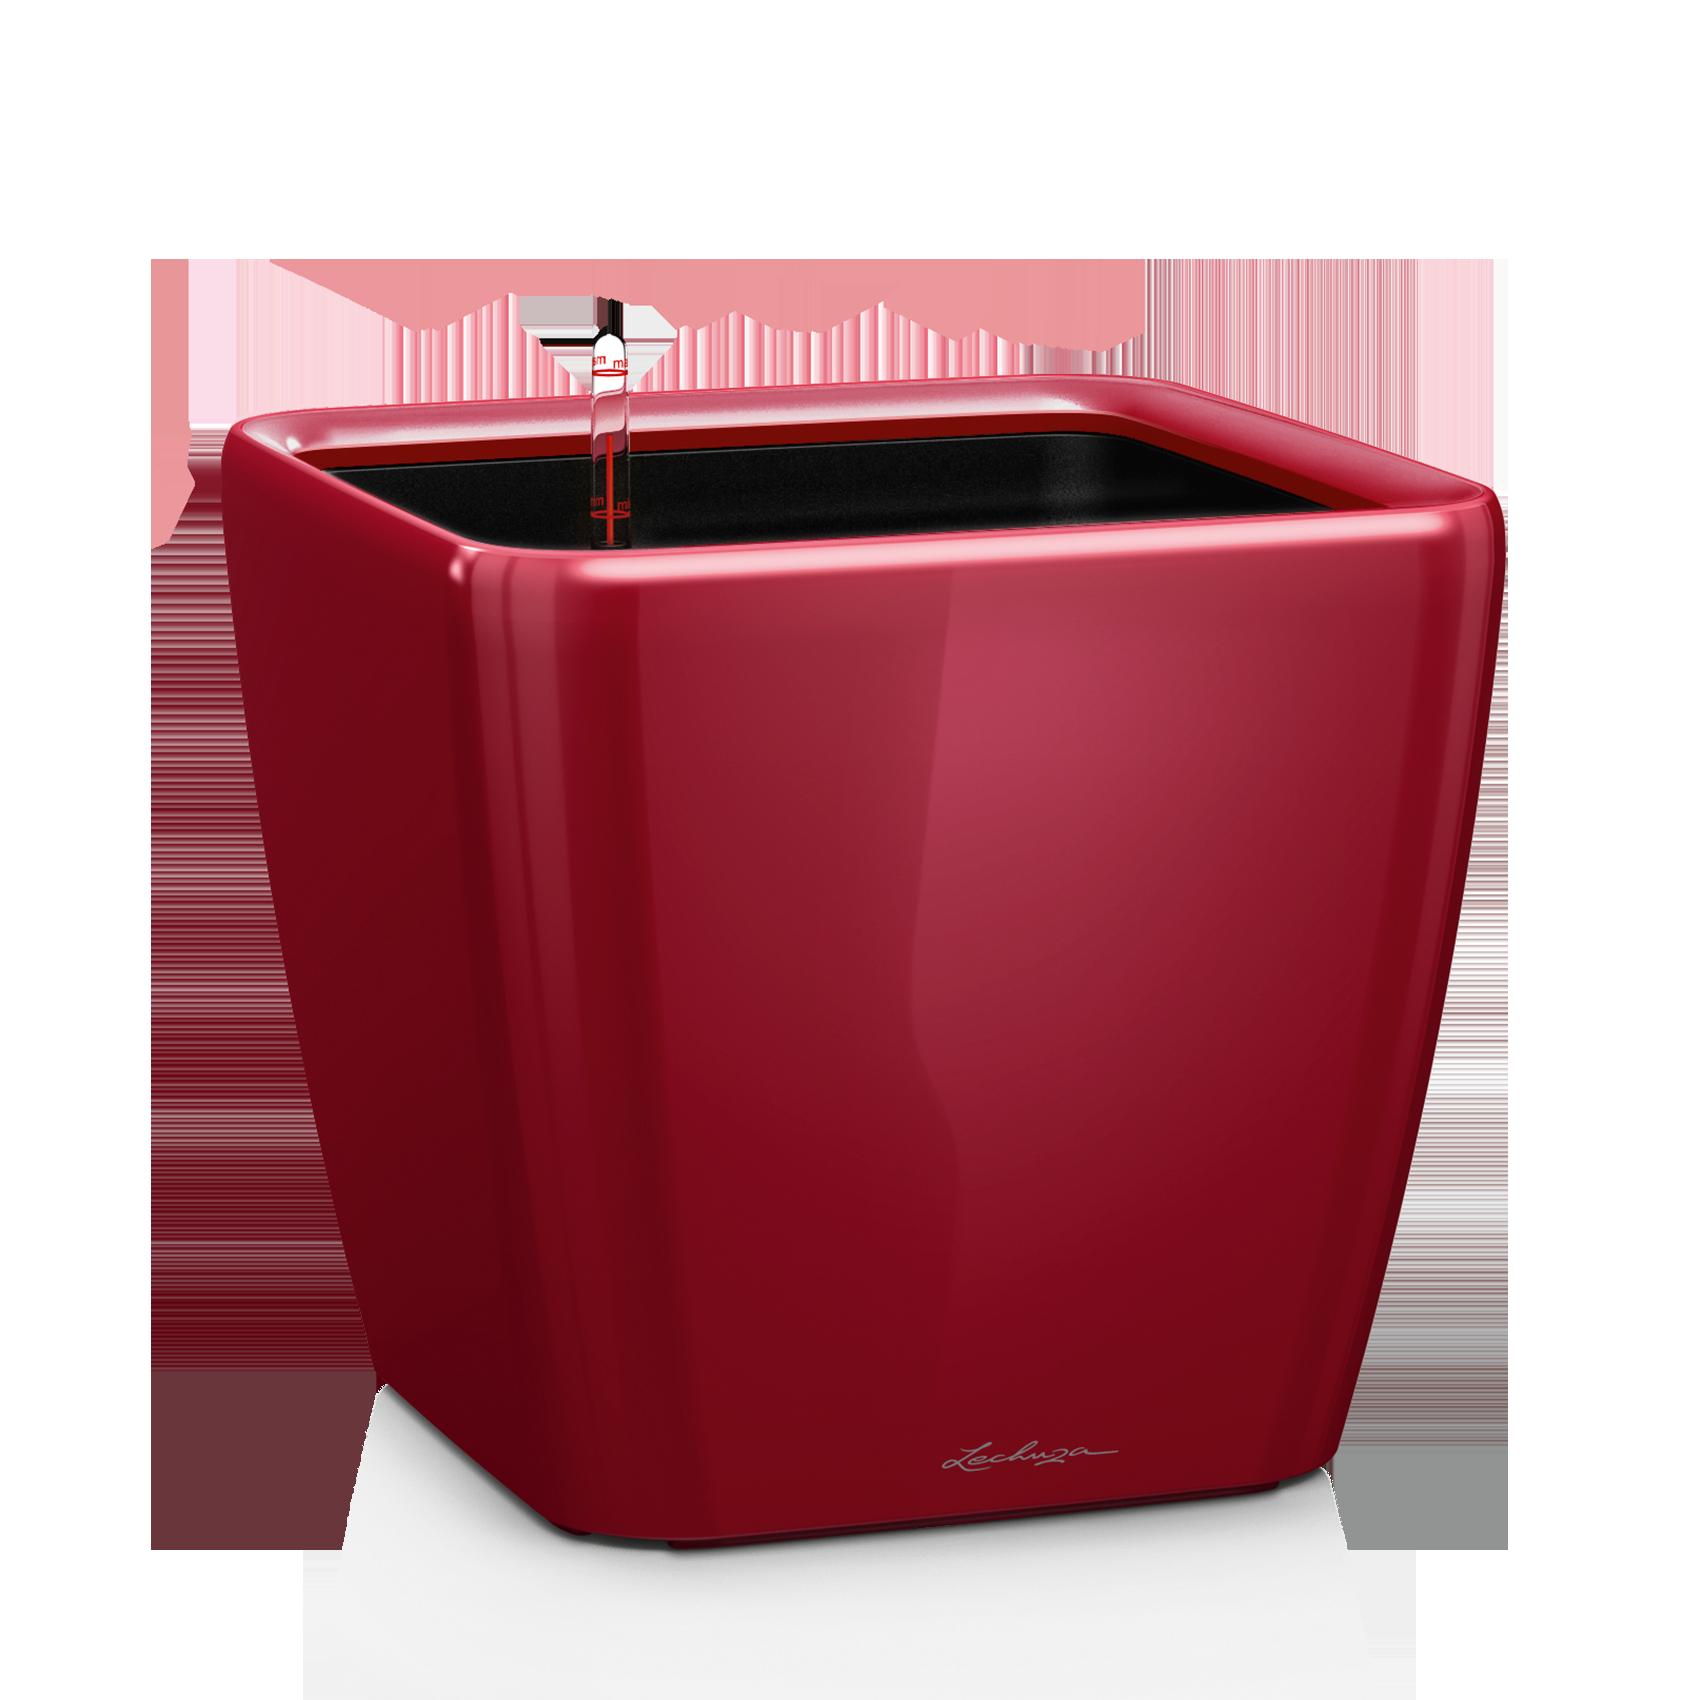 QUADRO LS 21 scarlet red high-gloss